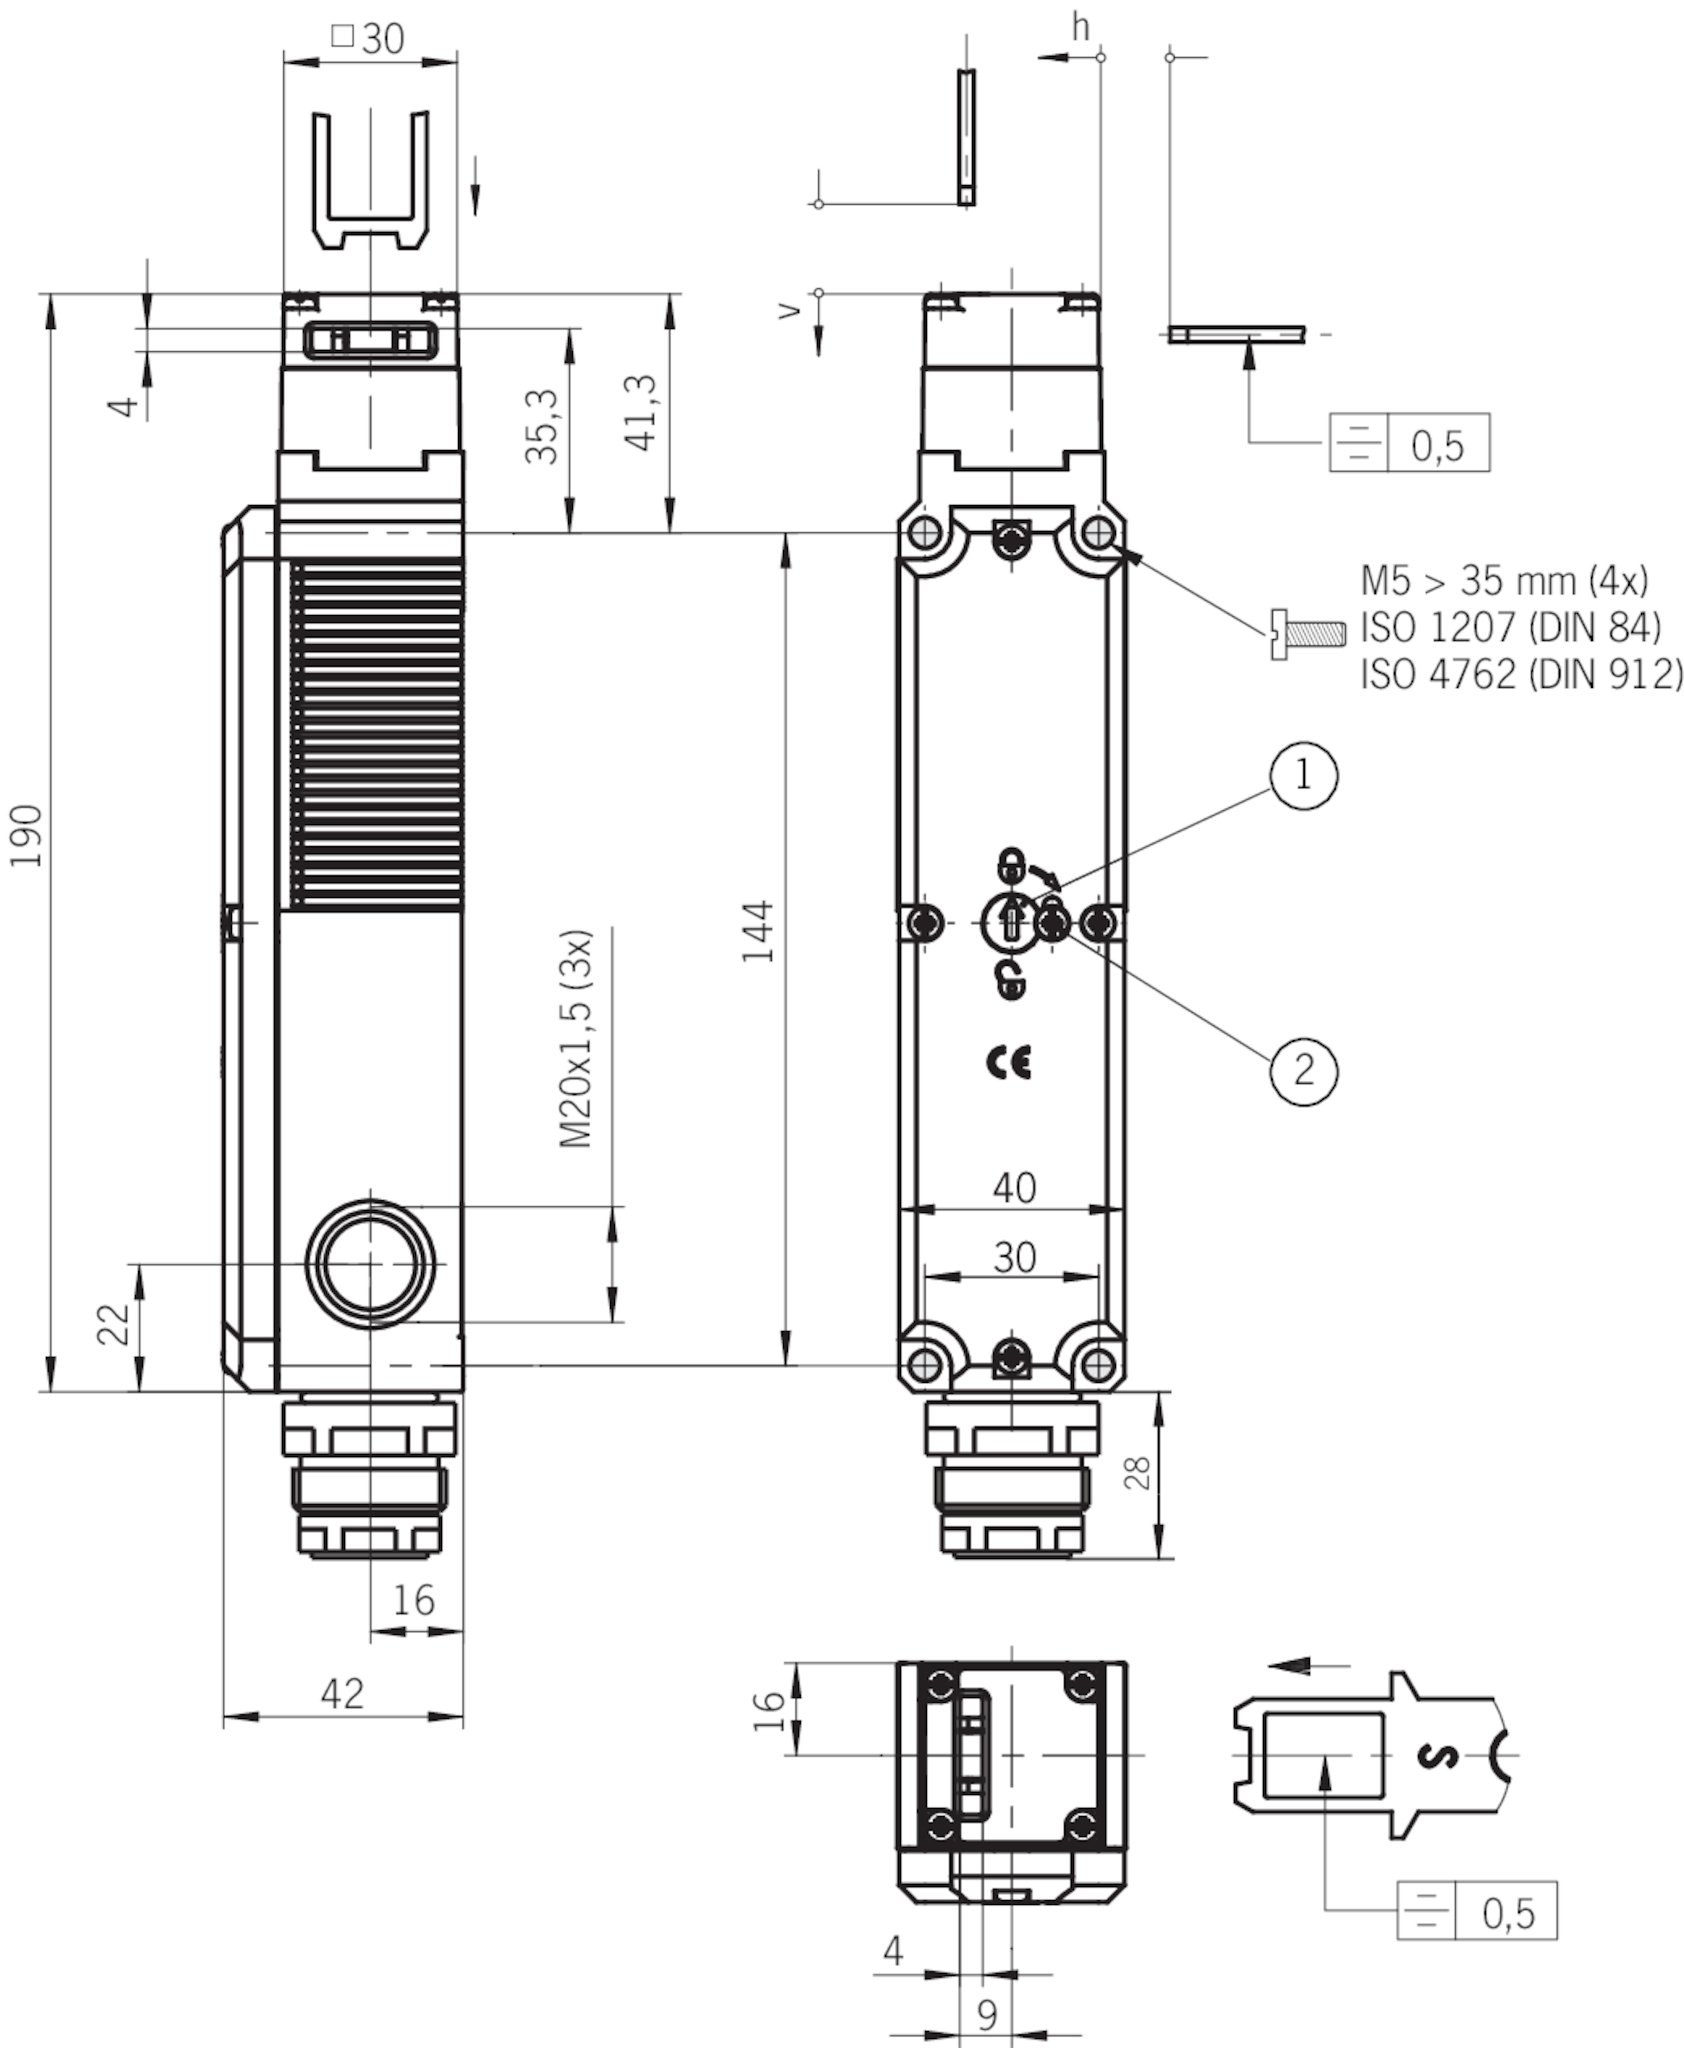 stp3a-4121a024sr11   euchner – more than safety. stp3 wiring diagram e bike controller wiring diagram